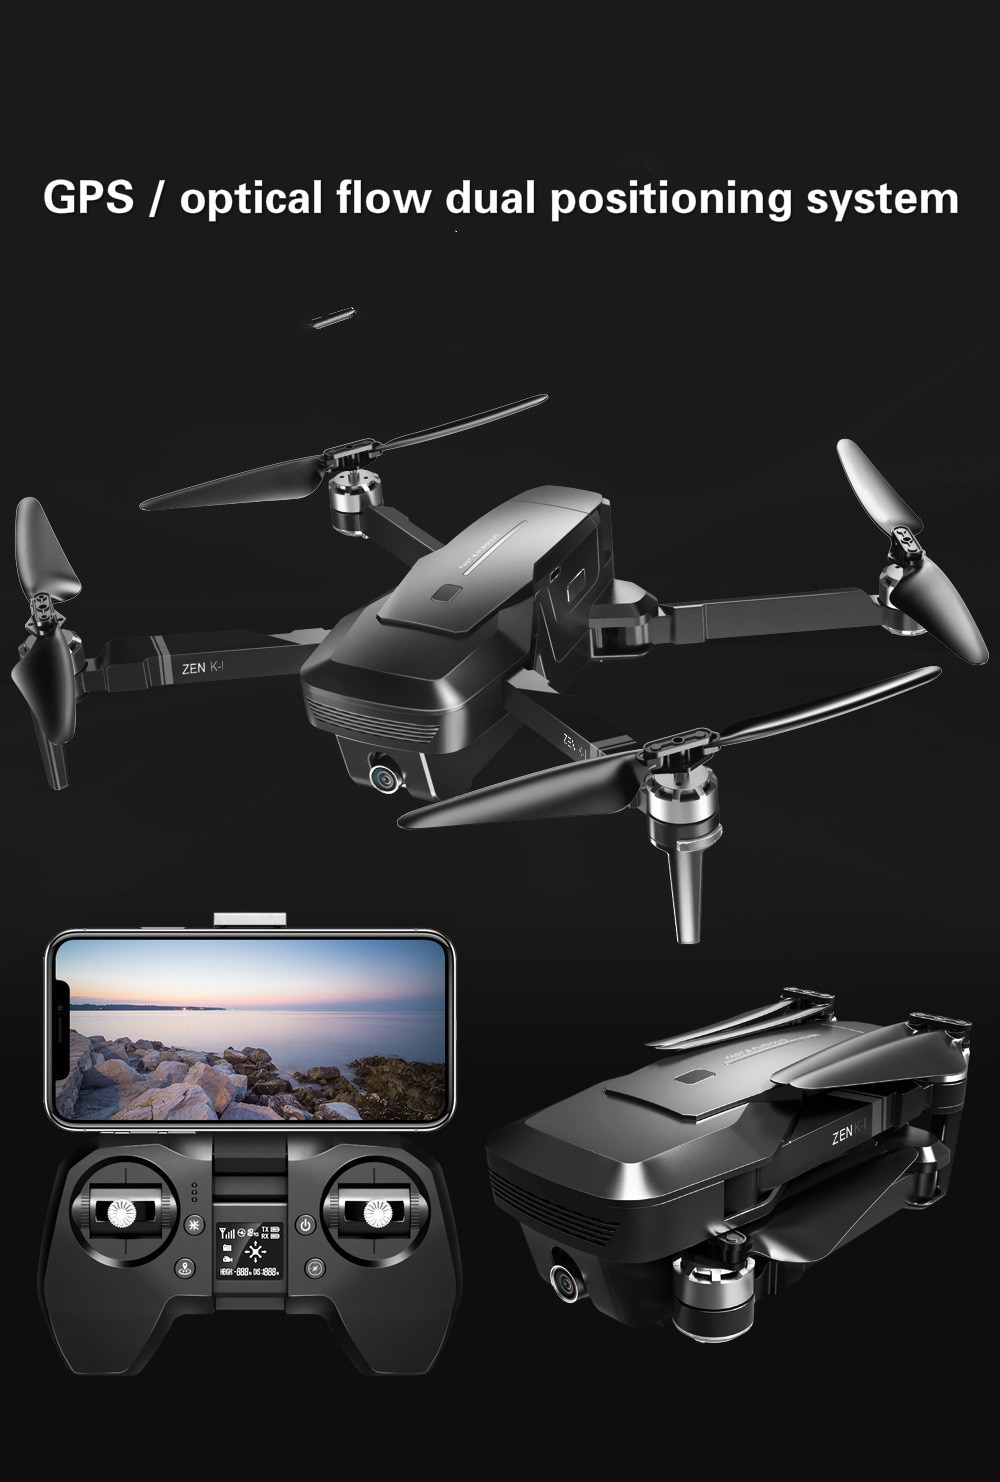 Nueva fotografía aérea profesional plegable sin escobillas GPS 5G Wifi 4KCamera 4axis Panoramas Rc Quadcopter Rtf Dron Uav juguetes de regalo